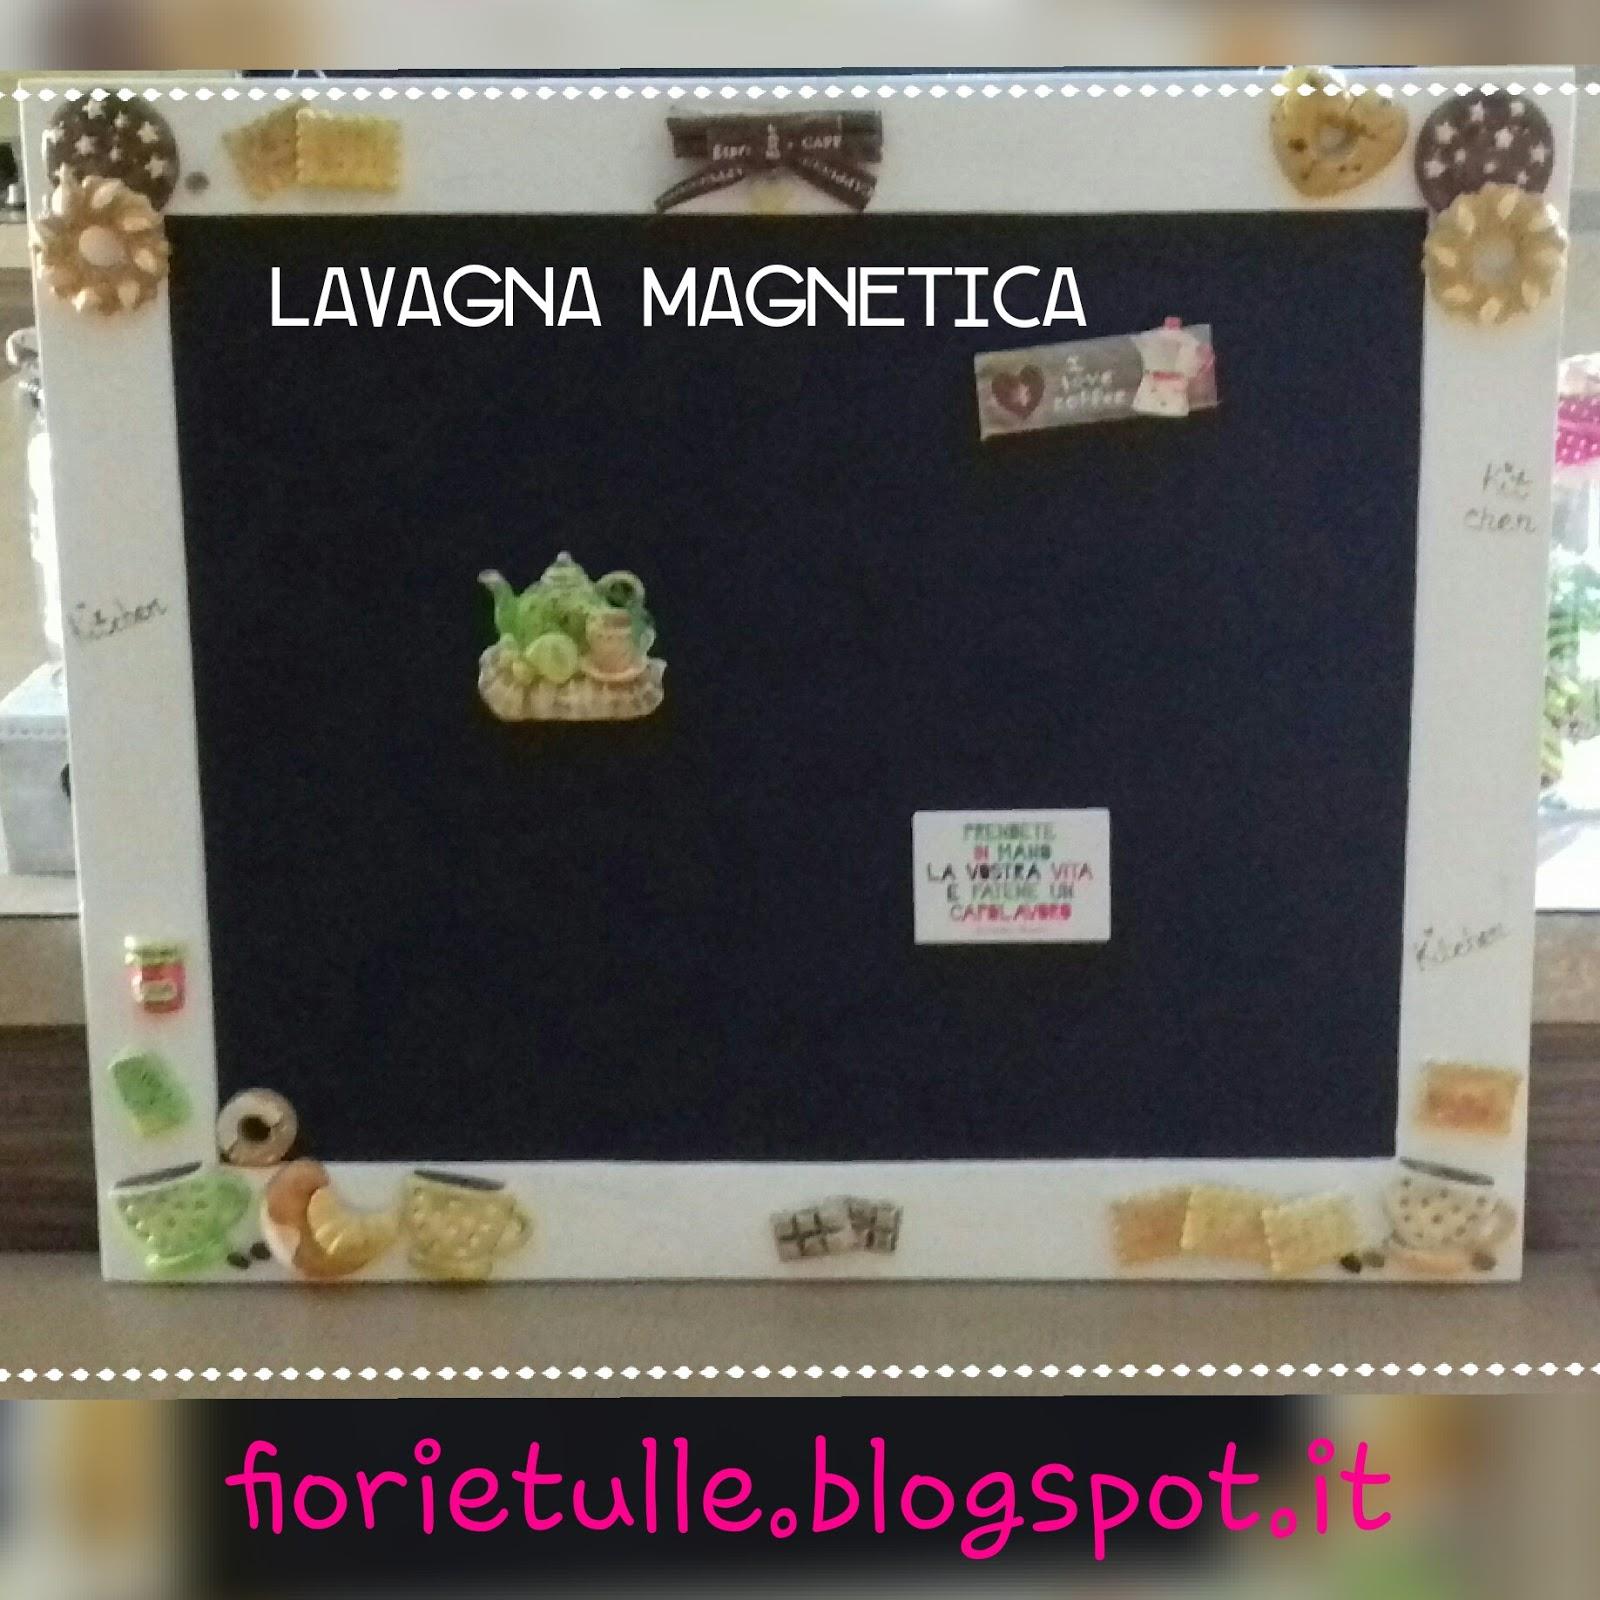 Lavagnette Per Cucina | Lavagna Magnetica Per Cucina Affordable Ora ...